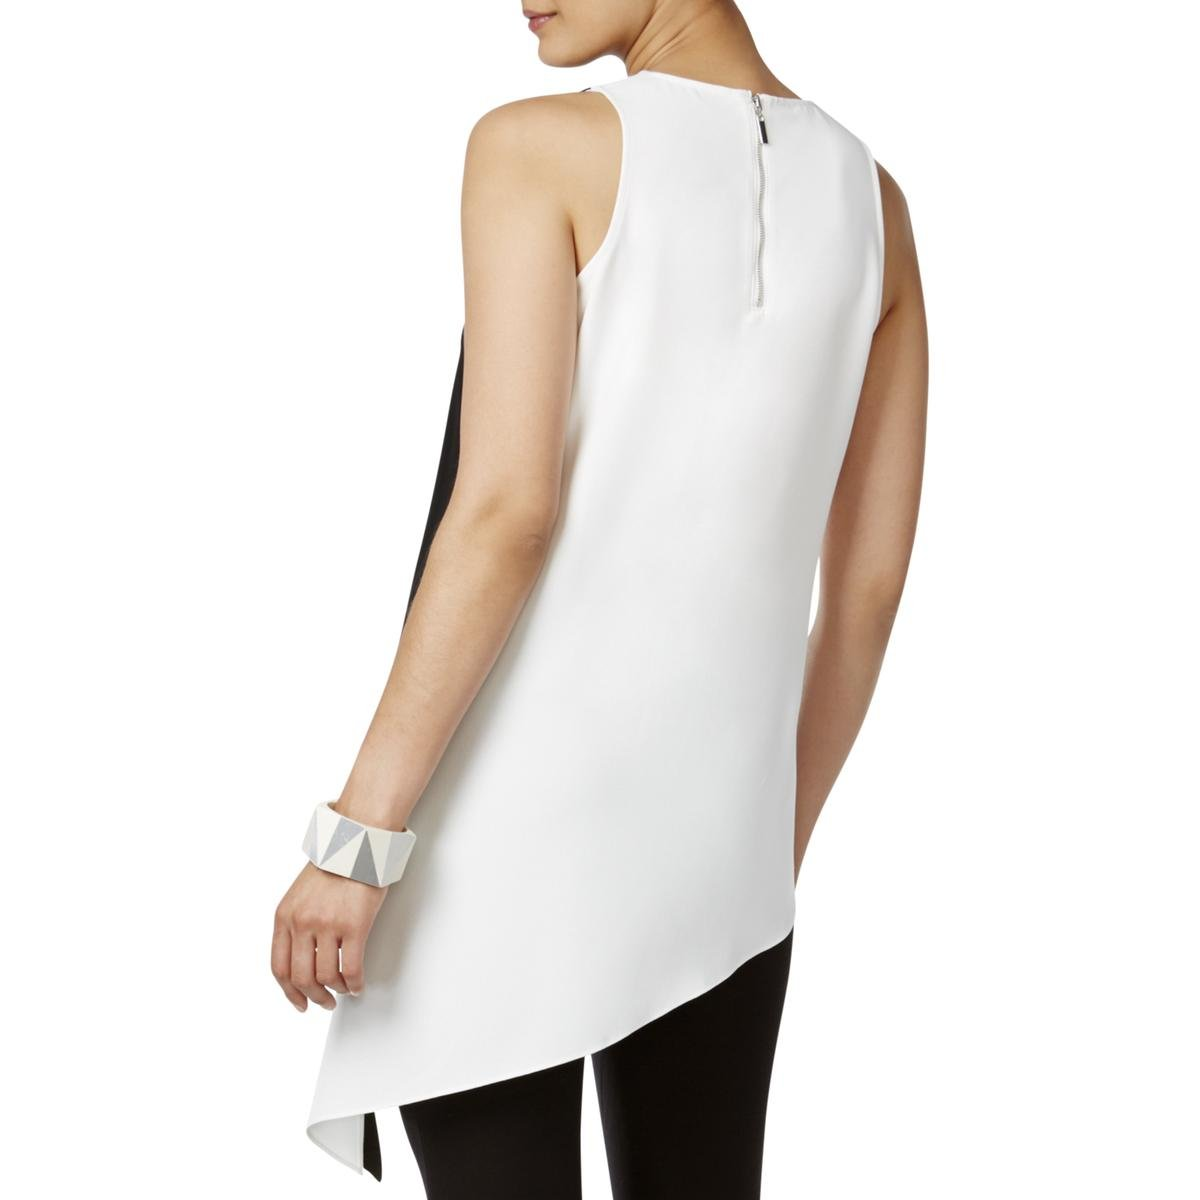 Alfani Womens Colorblock Asymmetrical Tunic Top B/W 6 by Alfani (Image #2)